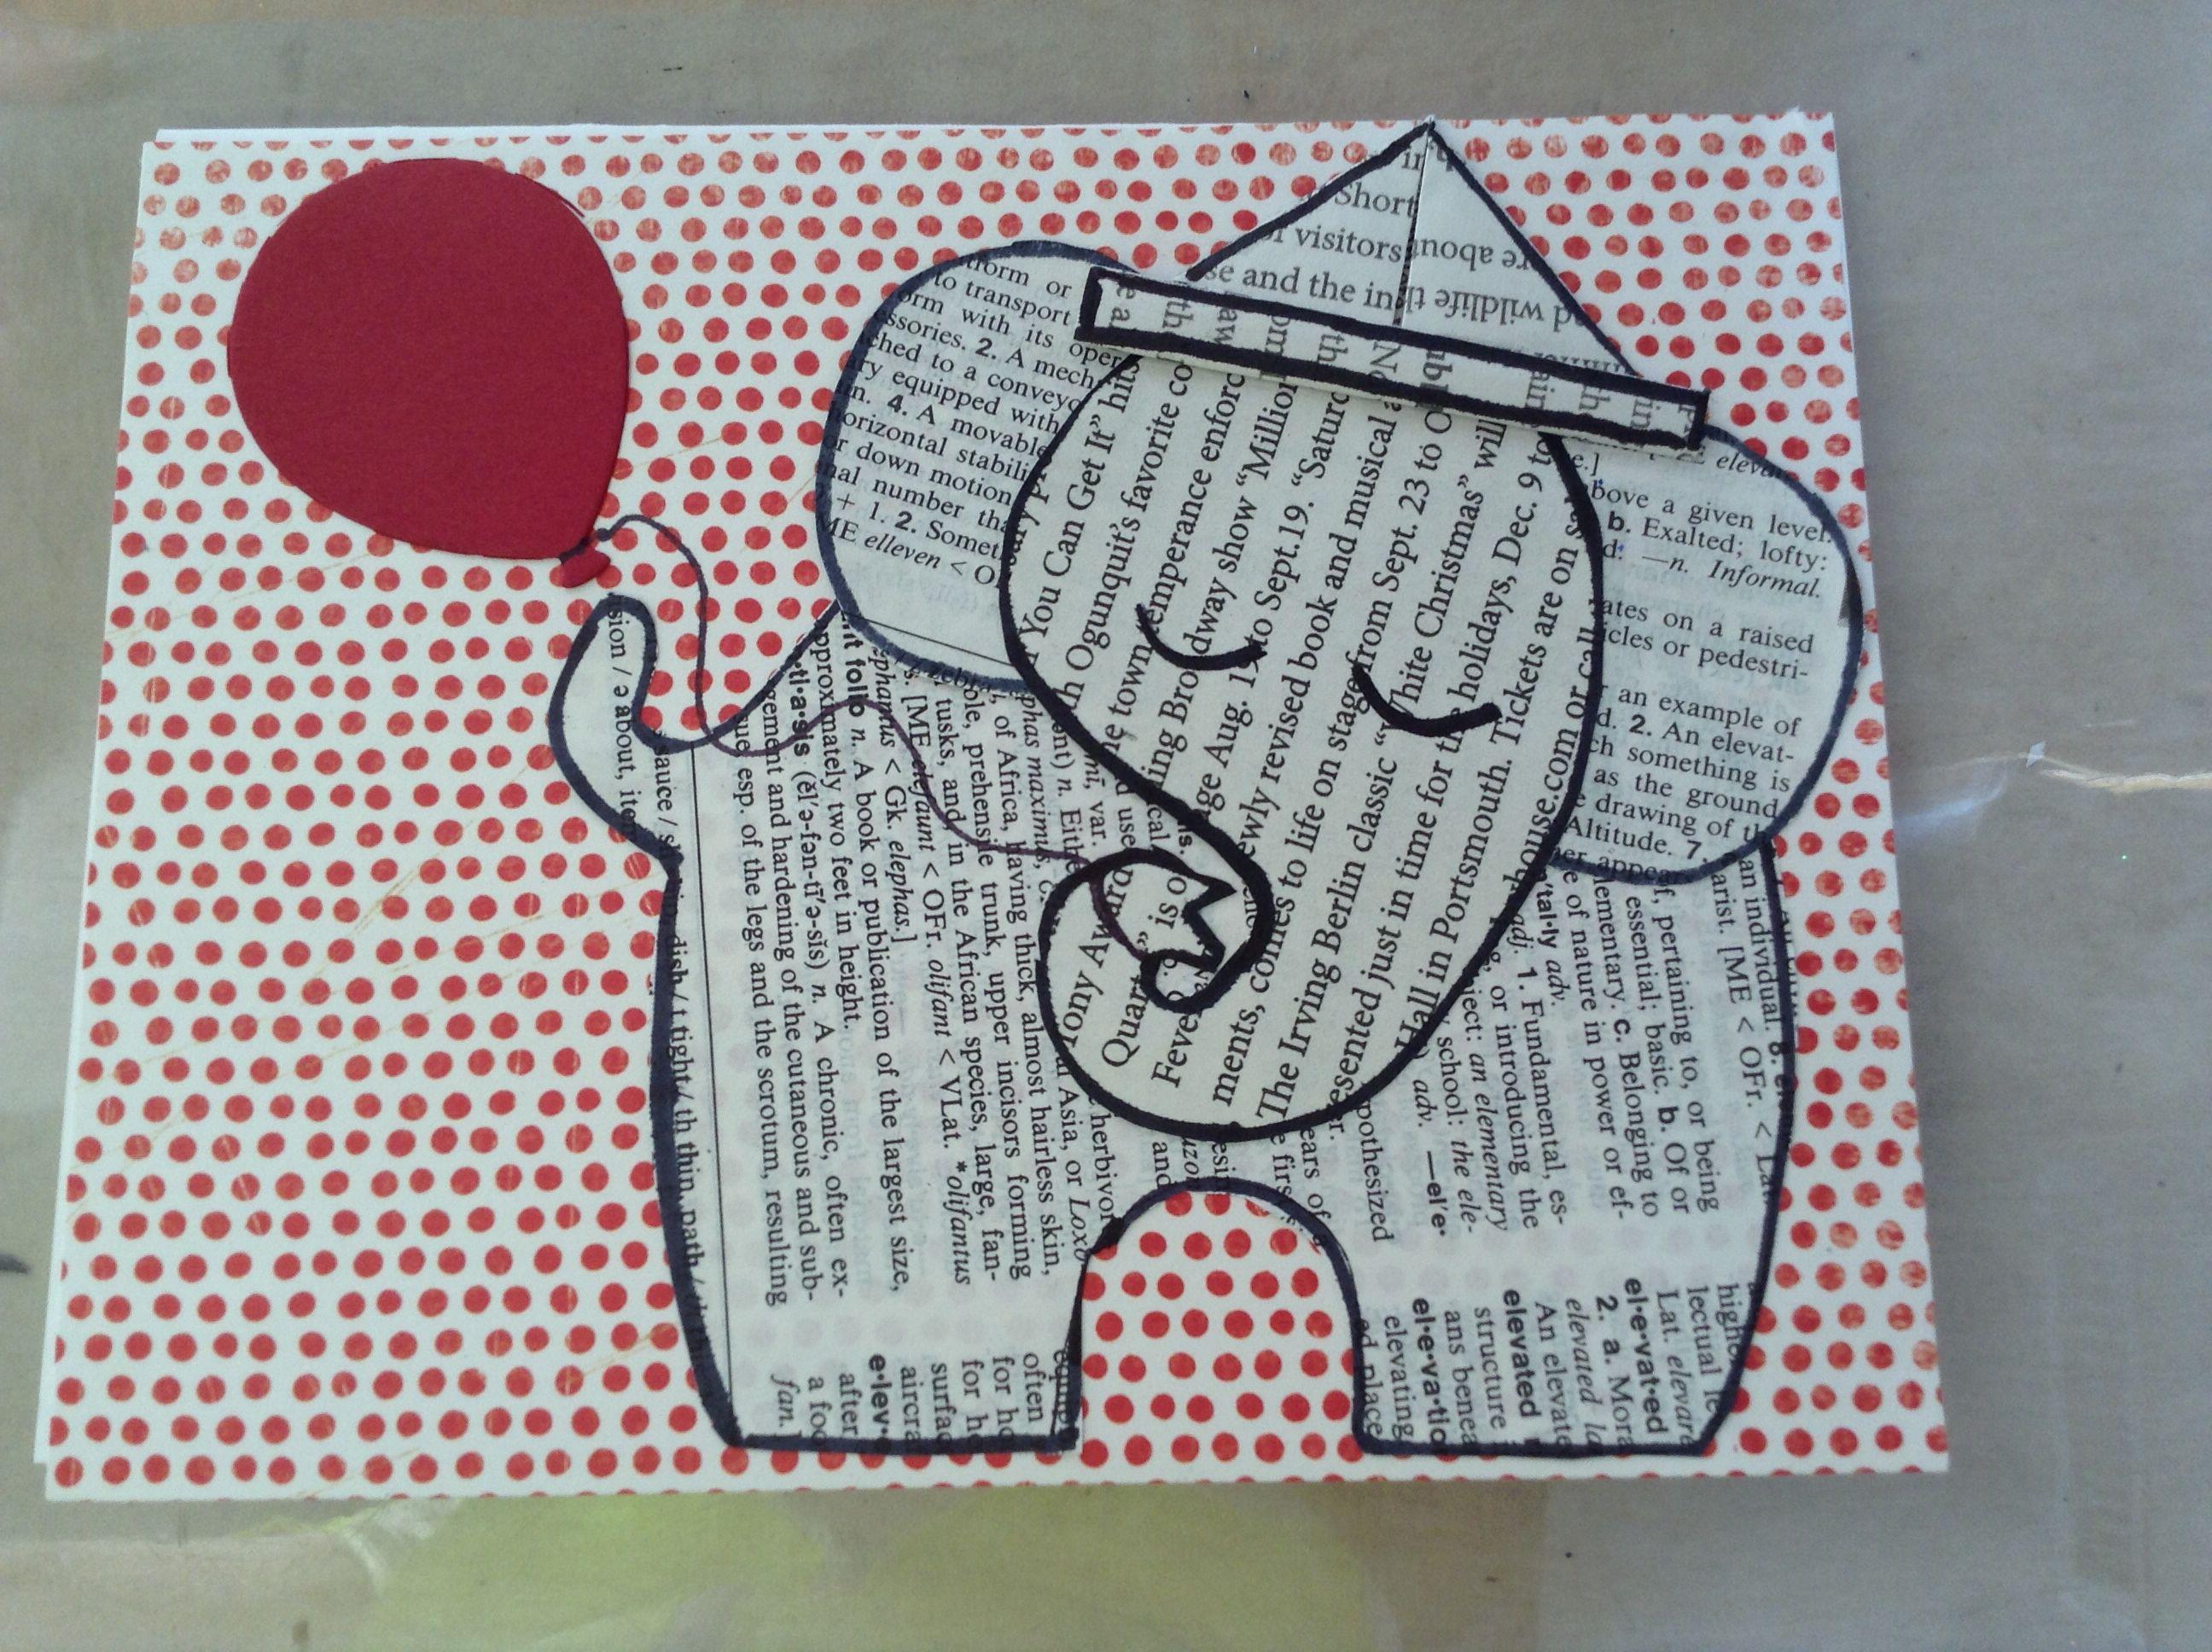 7/19/2015 Elephants never forget!